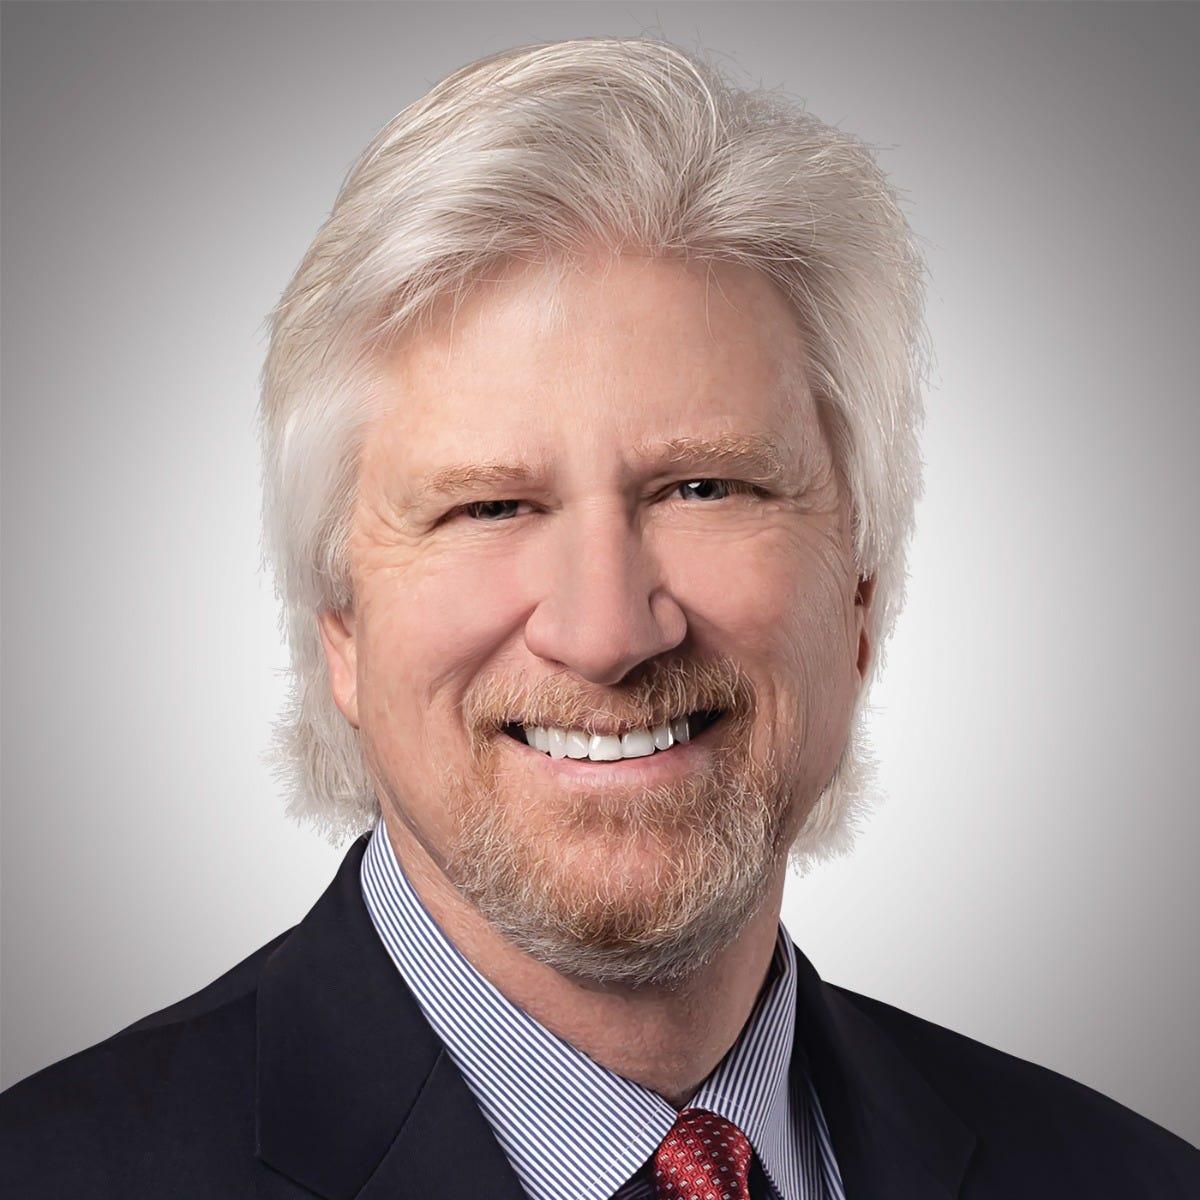 Dental Education Instructor - Timothy Kosinski, DDS, MAGD